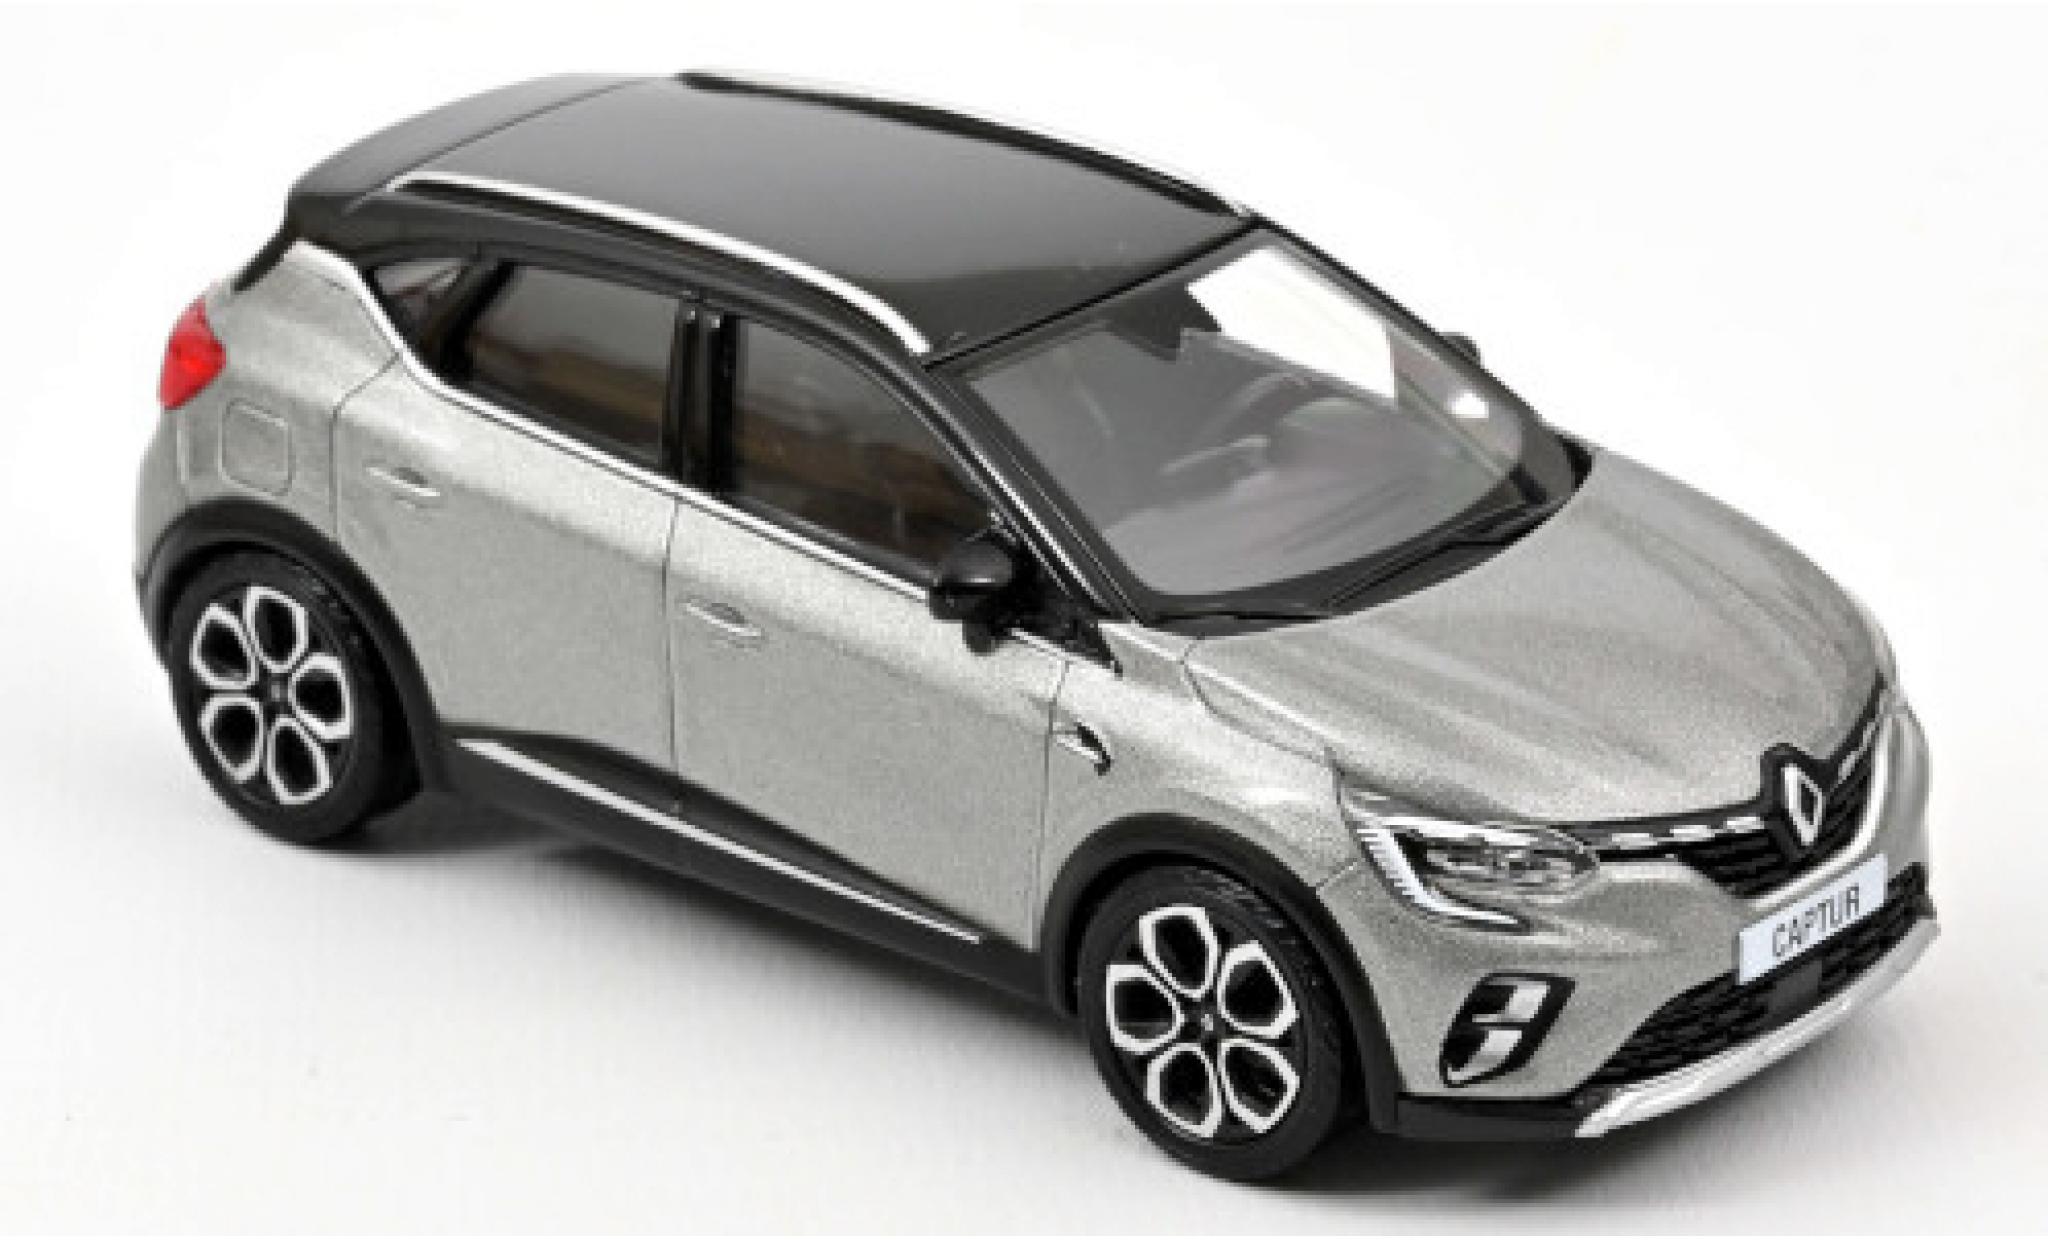 Renault Captur 1/43 Norev metallise grey/black 2020